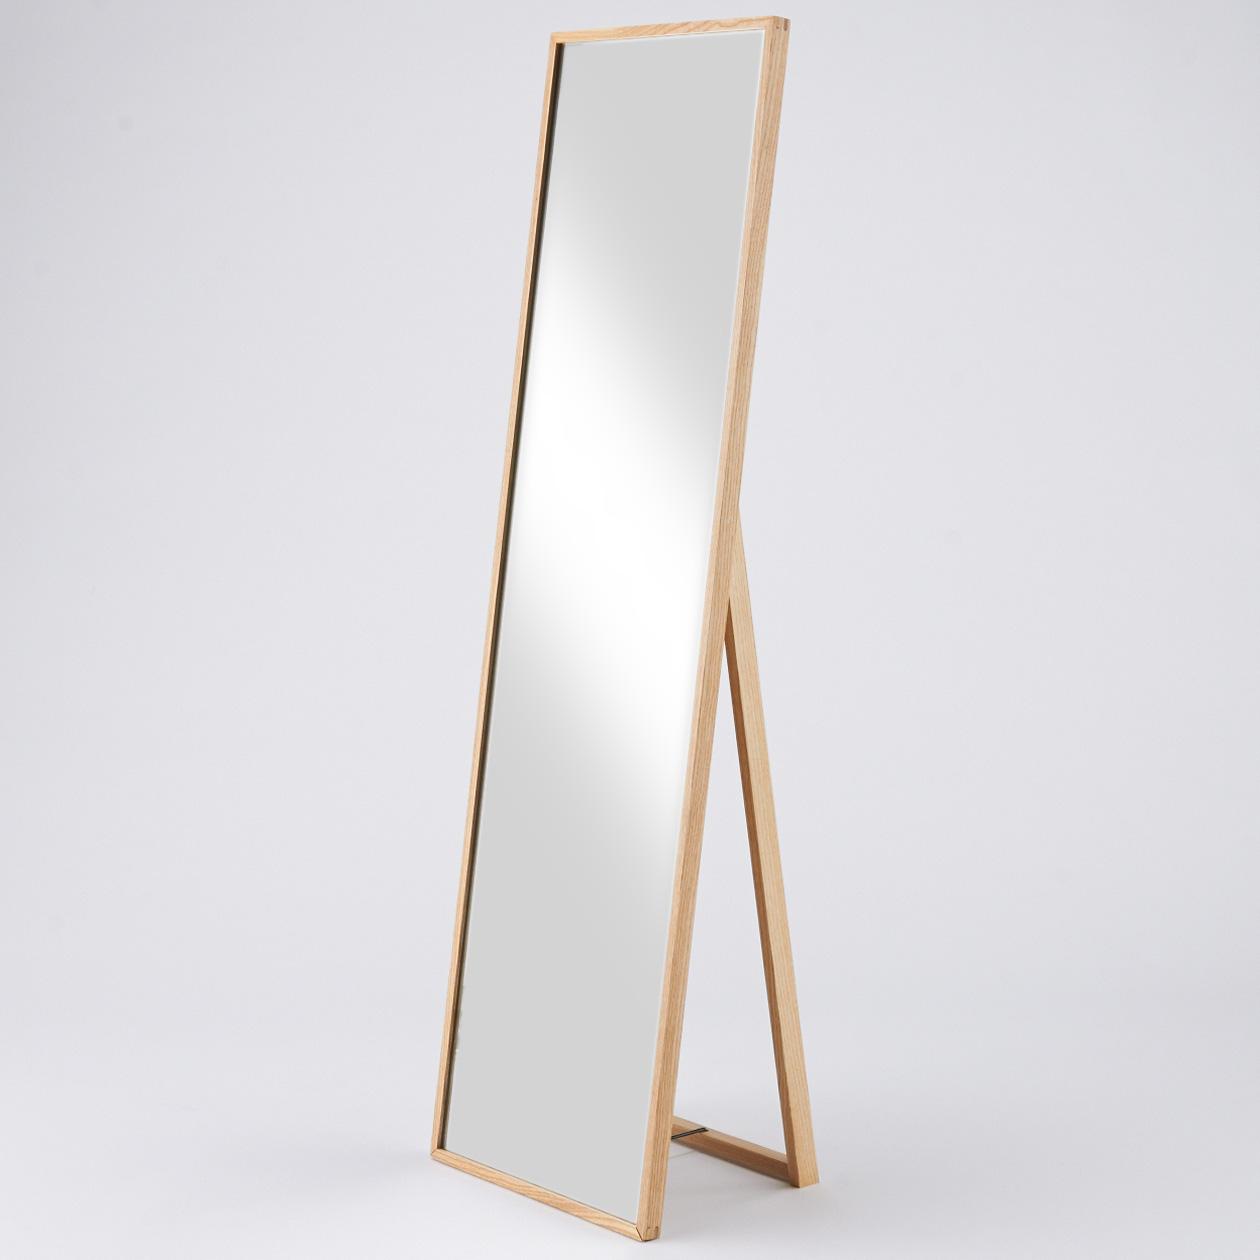 Oak Floor Standing Mirror - Flooring Ideas and Inspiration